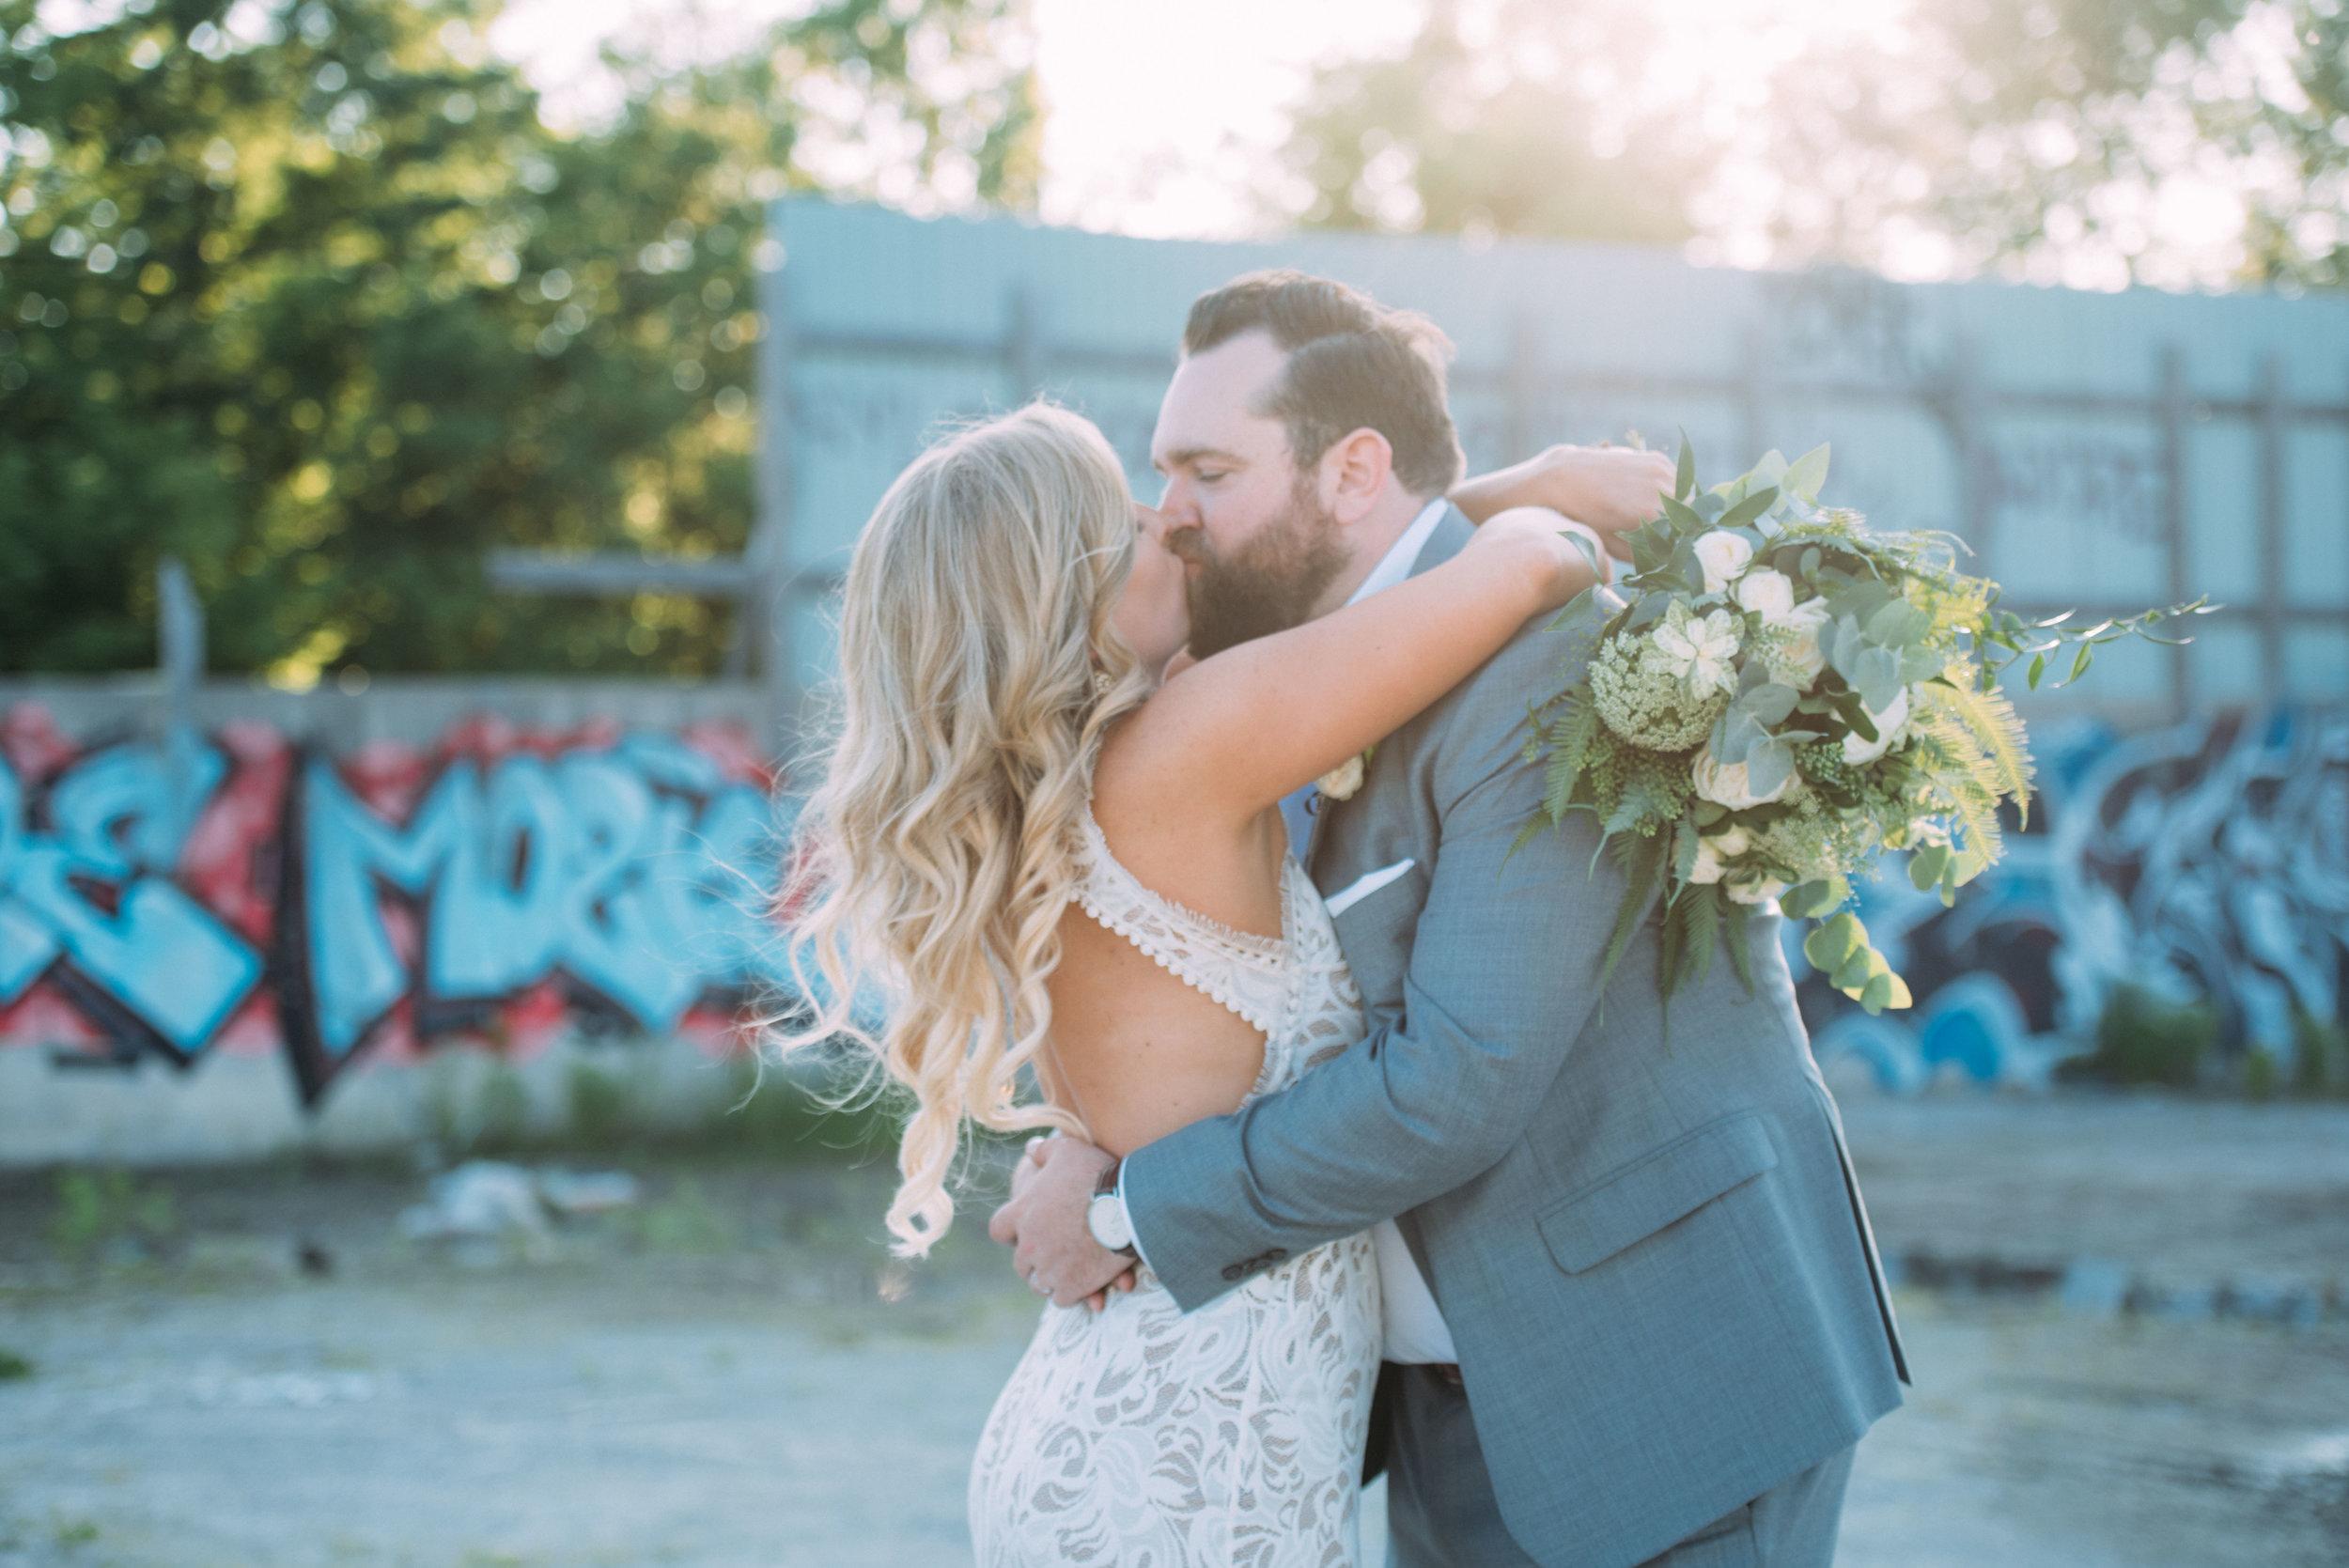 Propellor Coffee Co Wedding- Hamilton wedding photographer- Soundslikeyellowphotography 2019.jpg